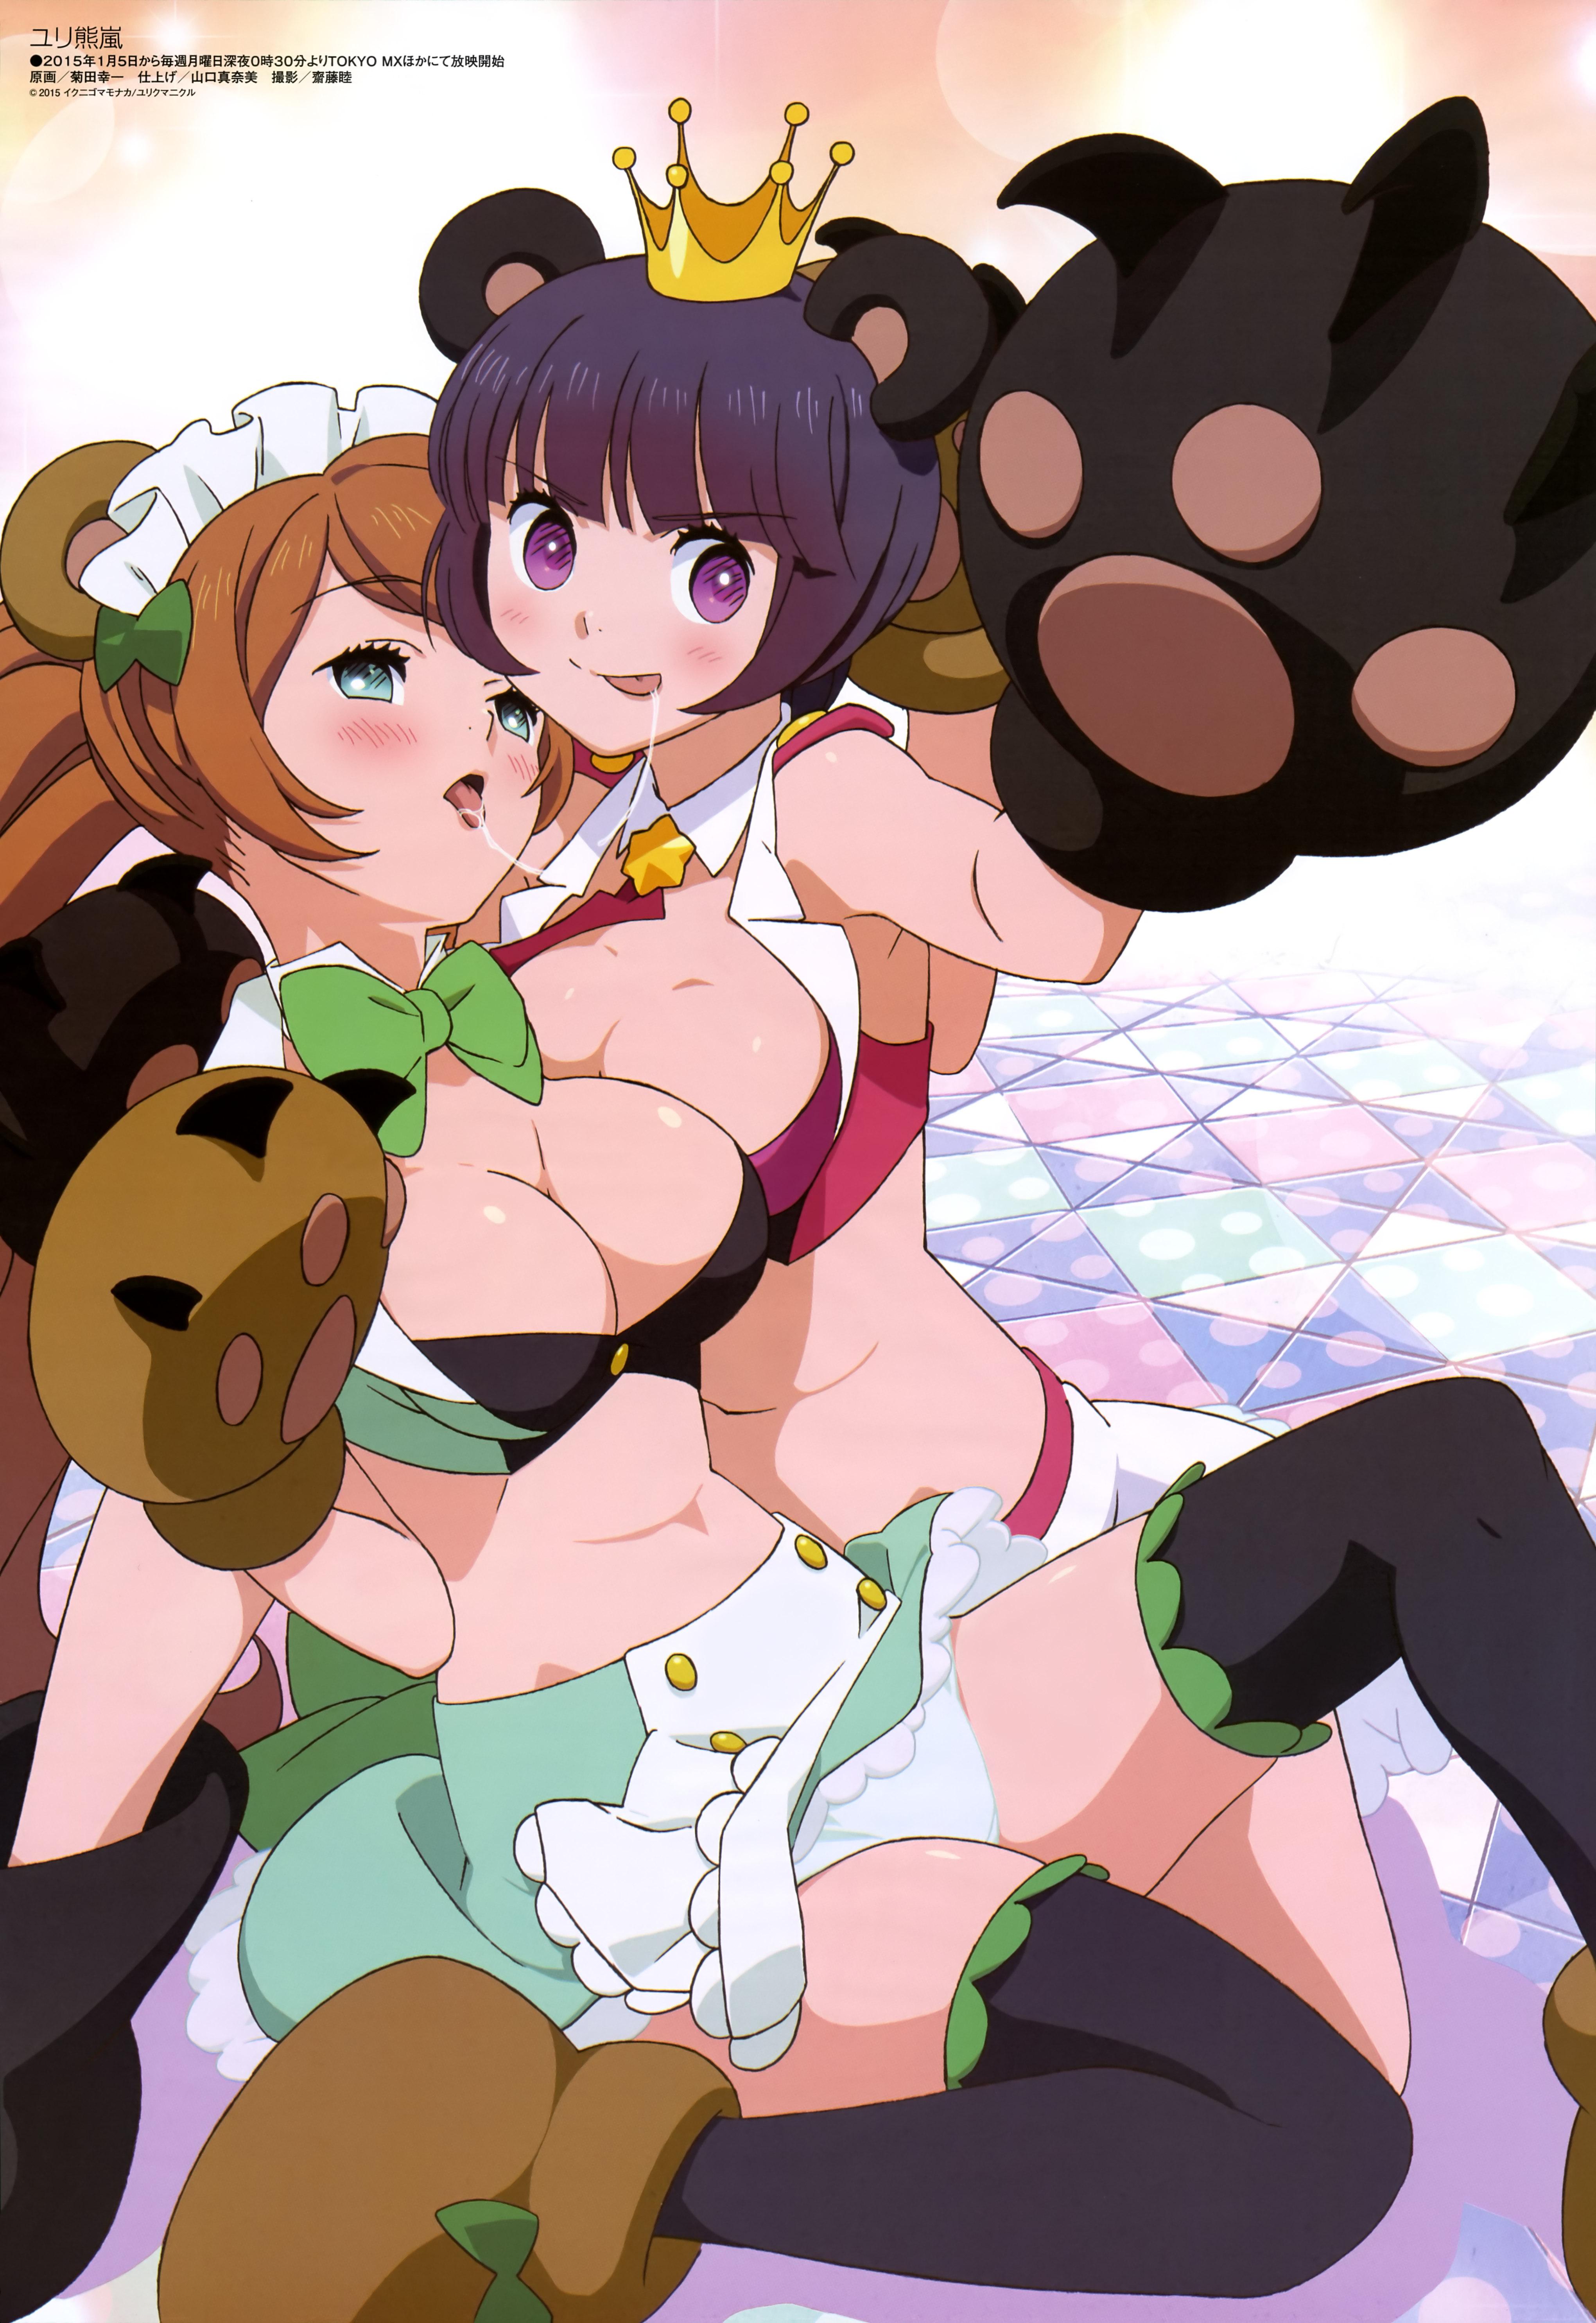 Yuri Kuma Arashi Haruhichan.com Megami MAGAZINE February 2015 anime posters